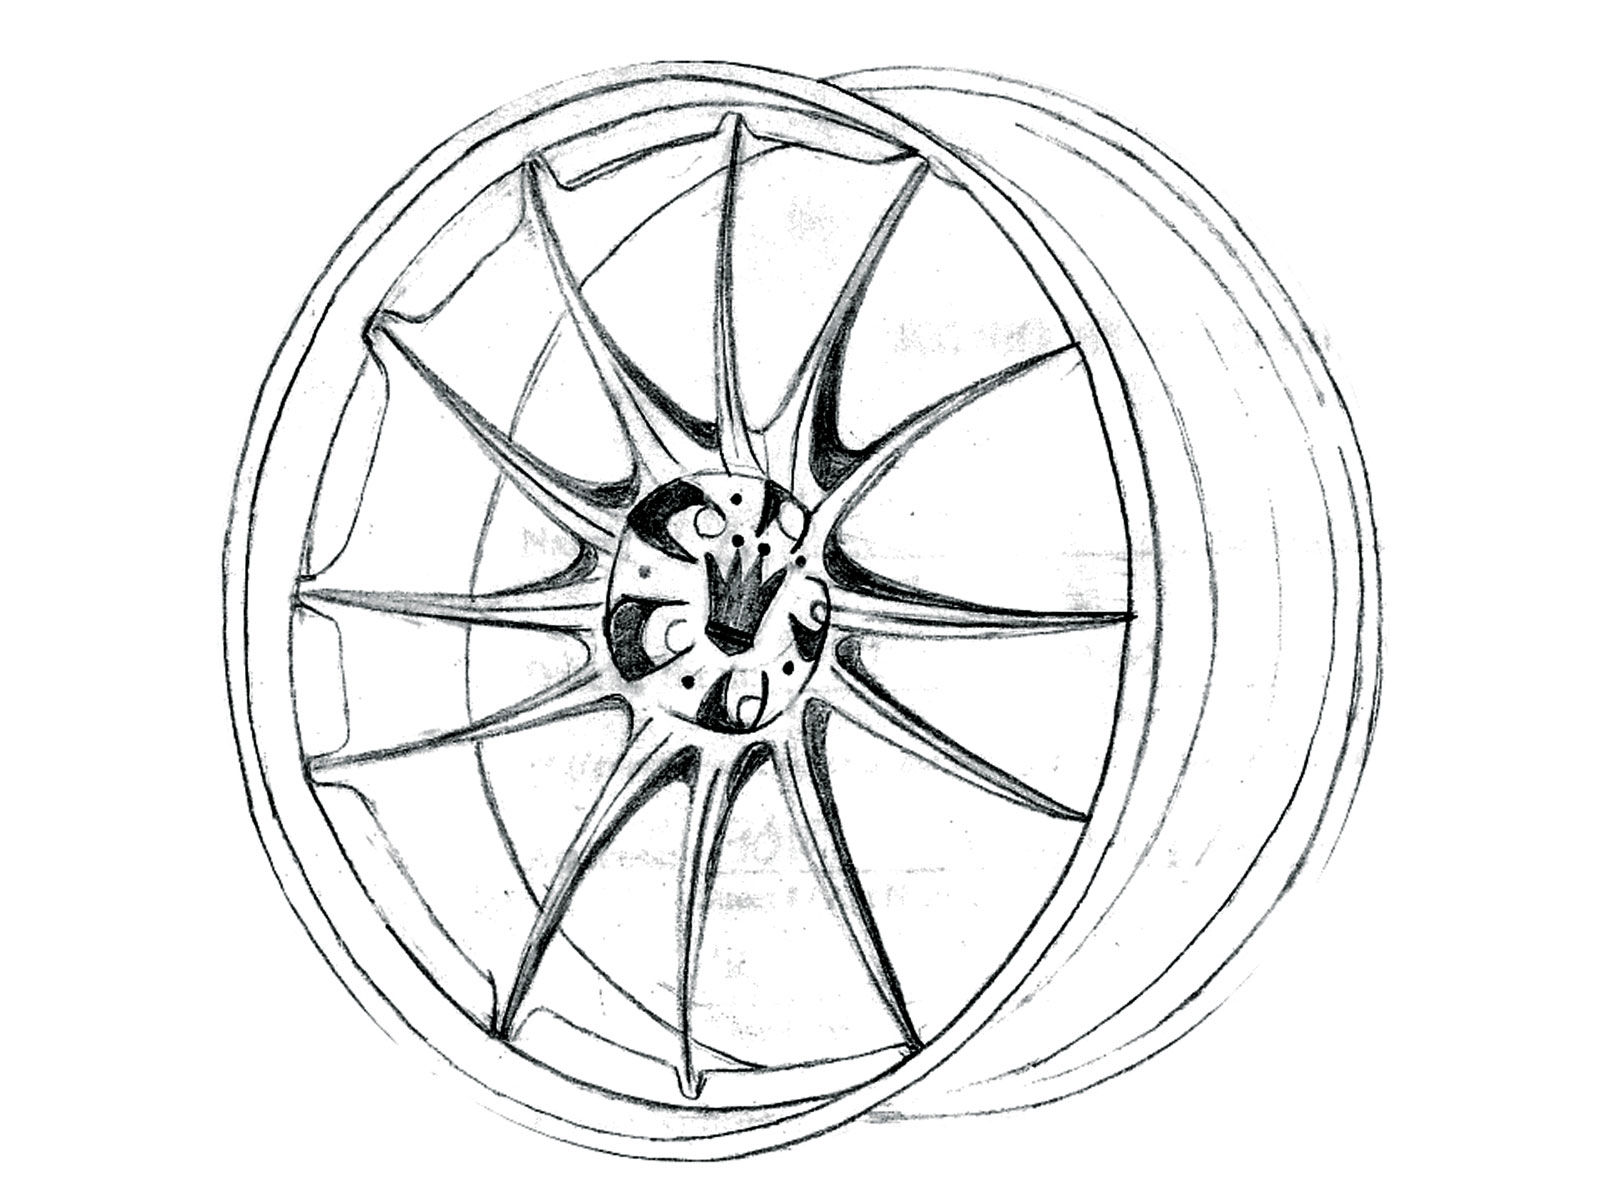 Third Annual Konig Wheel Design Contest